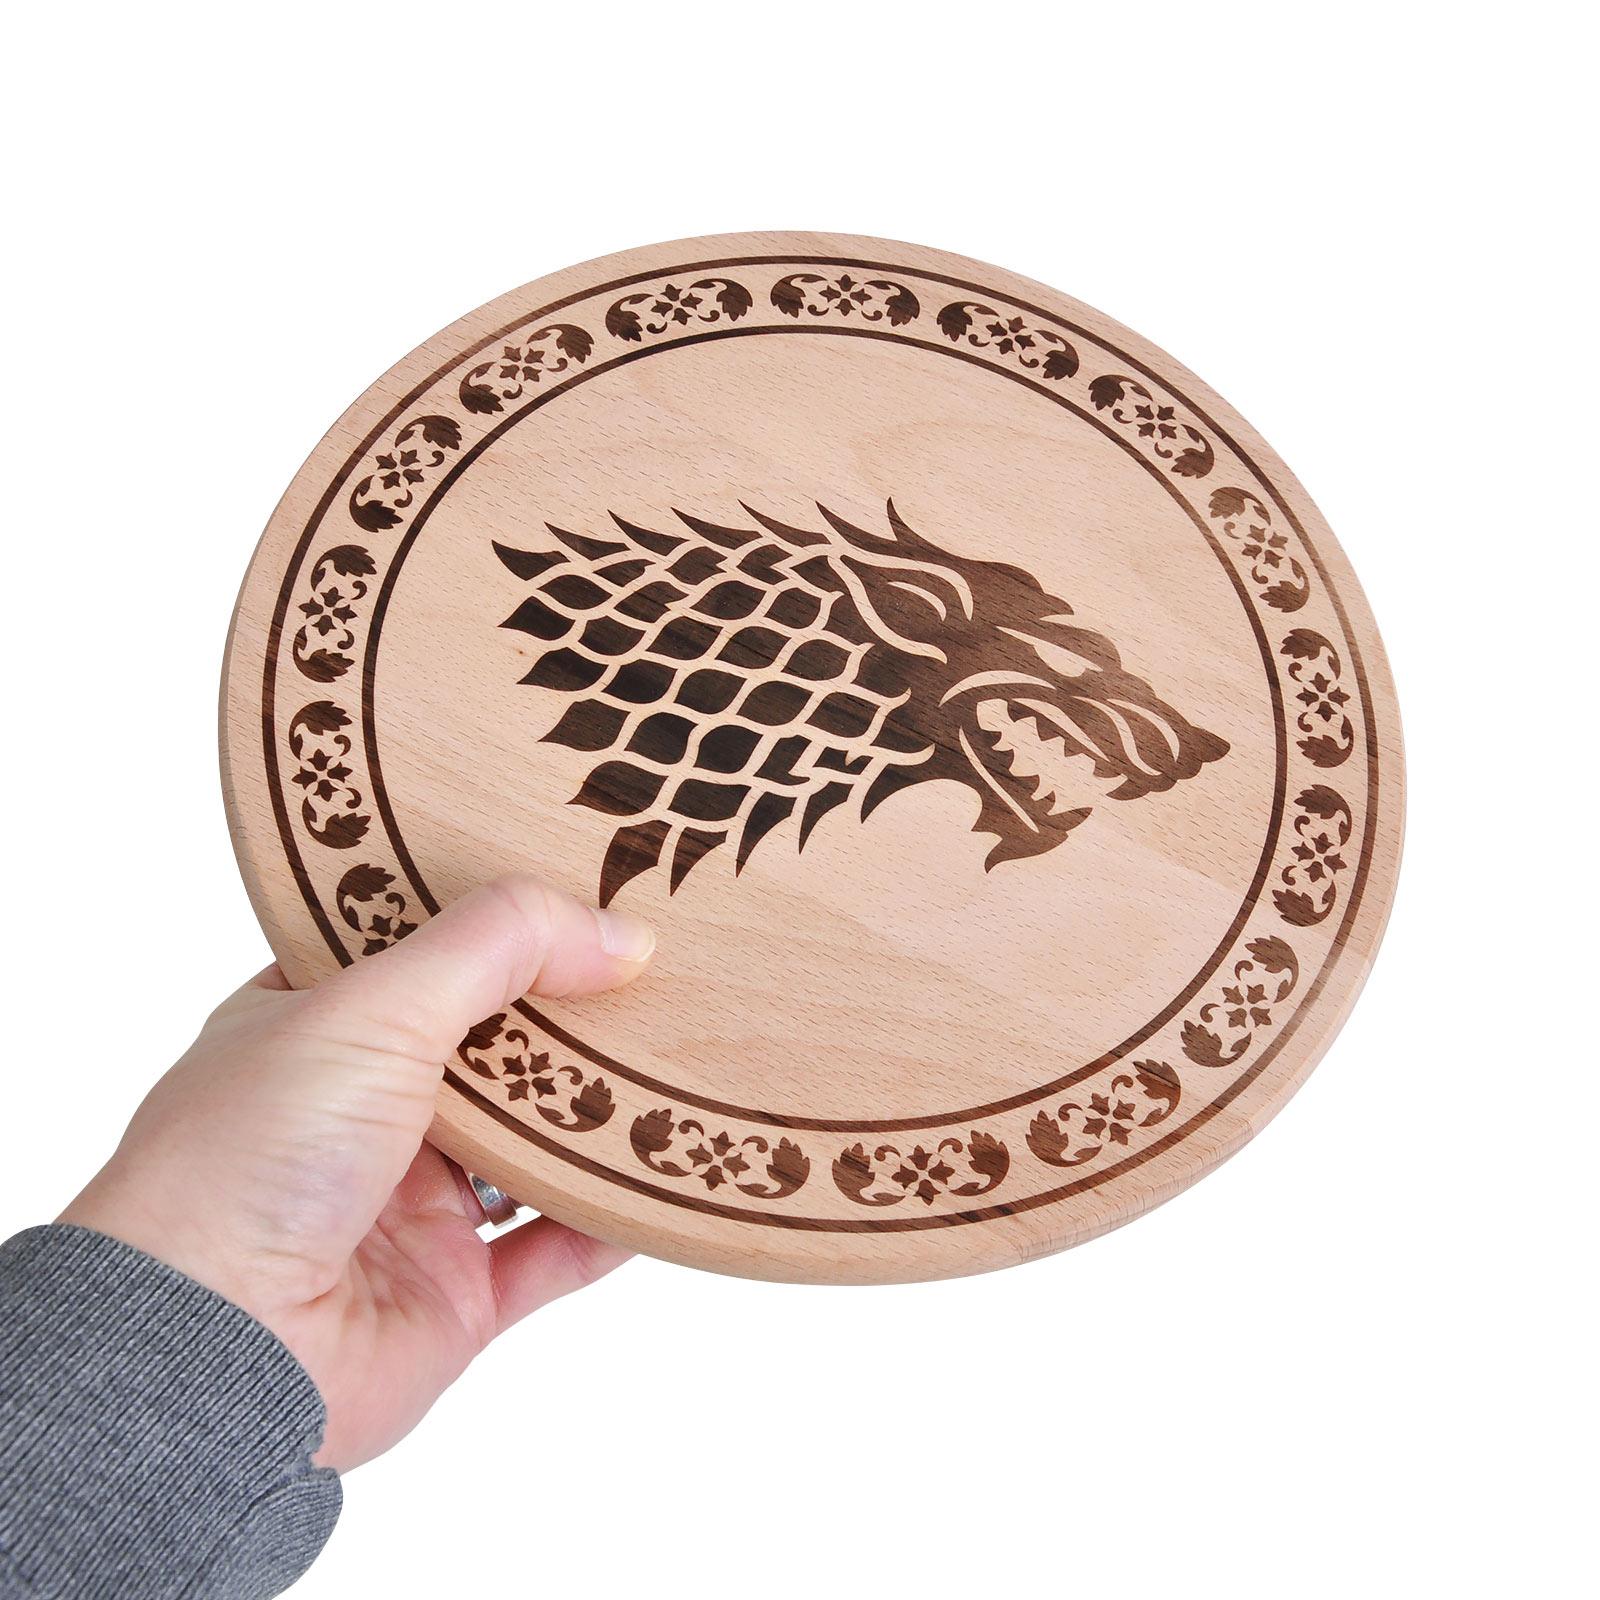 Game of Thrones - House Stark Schneidebrett Buche